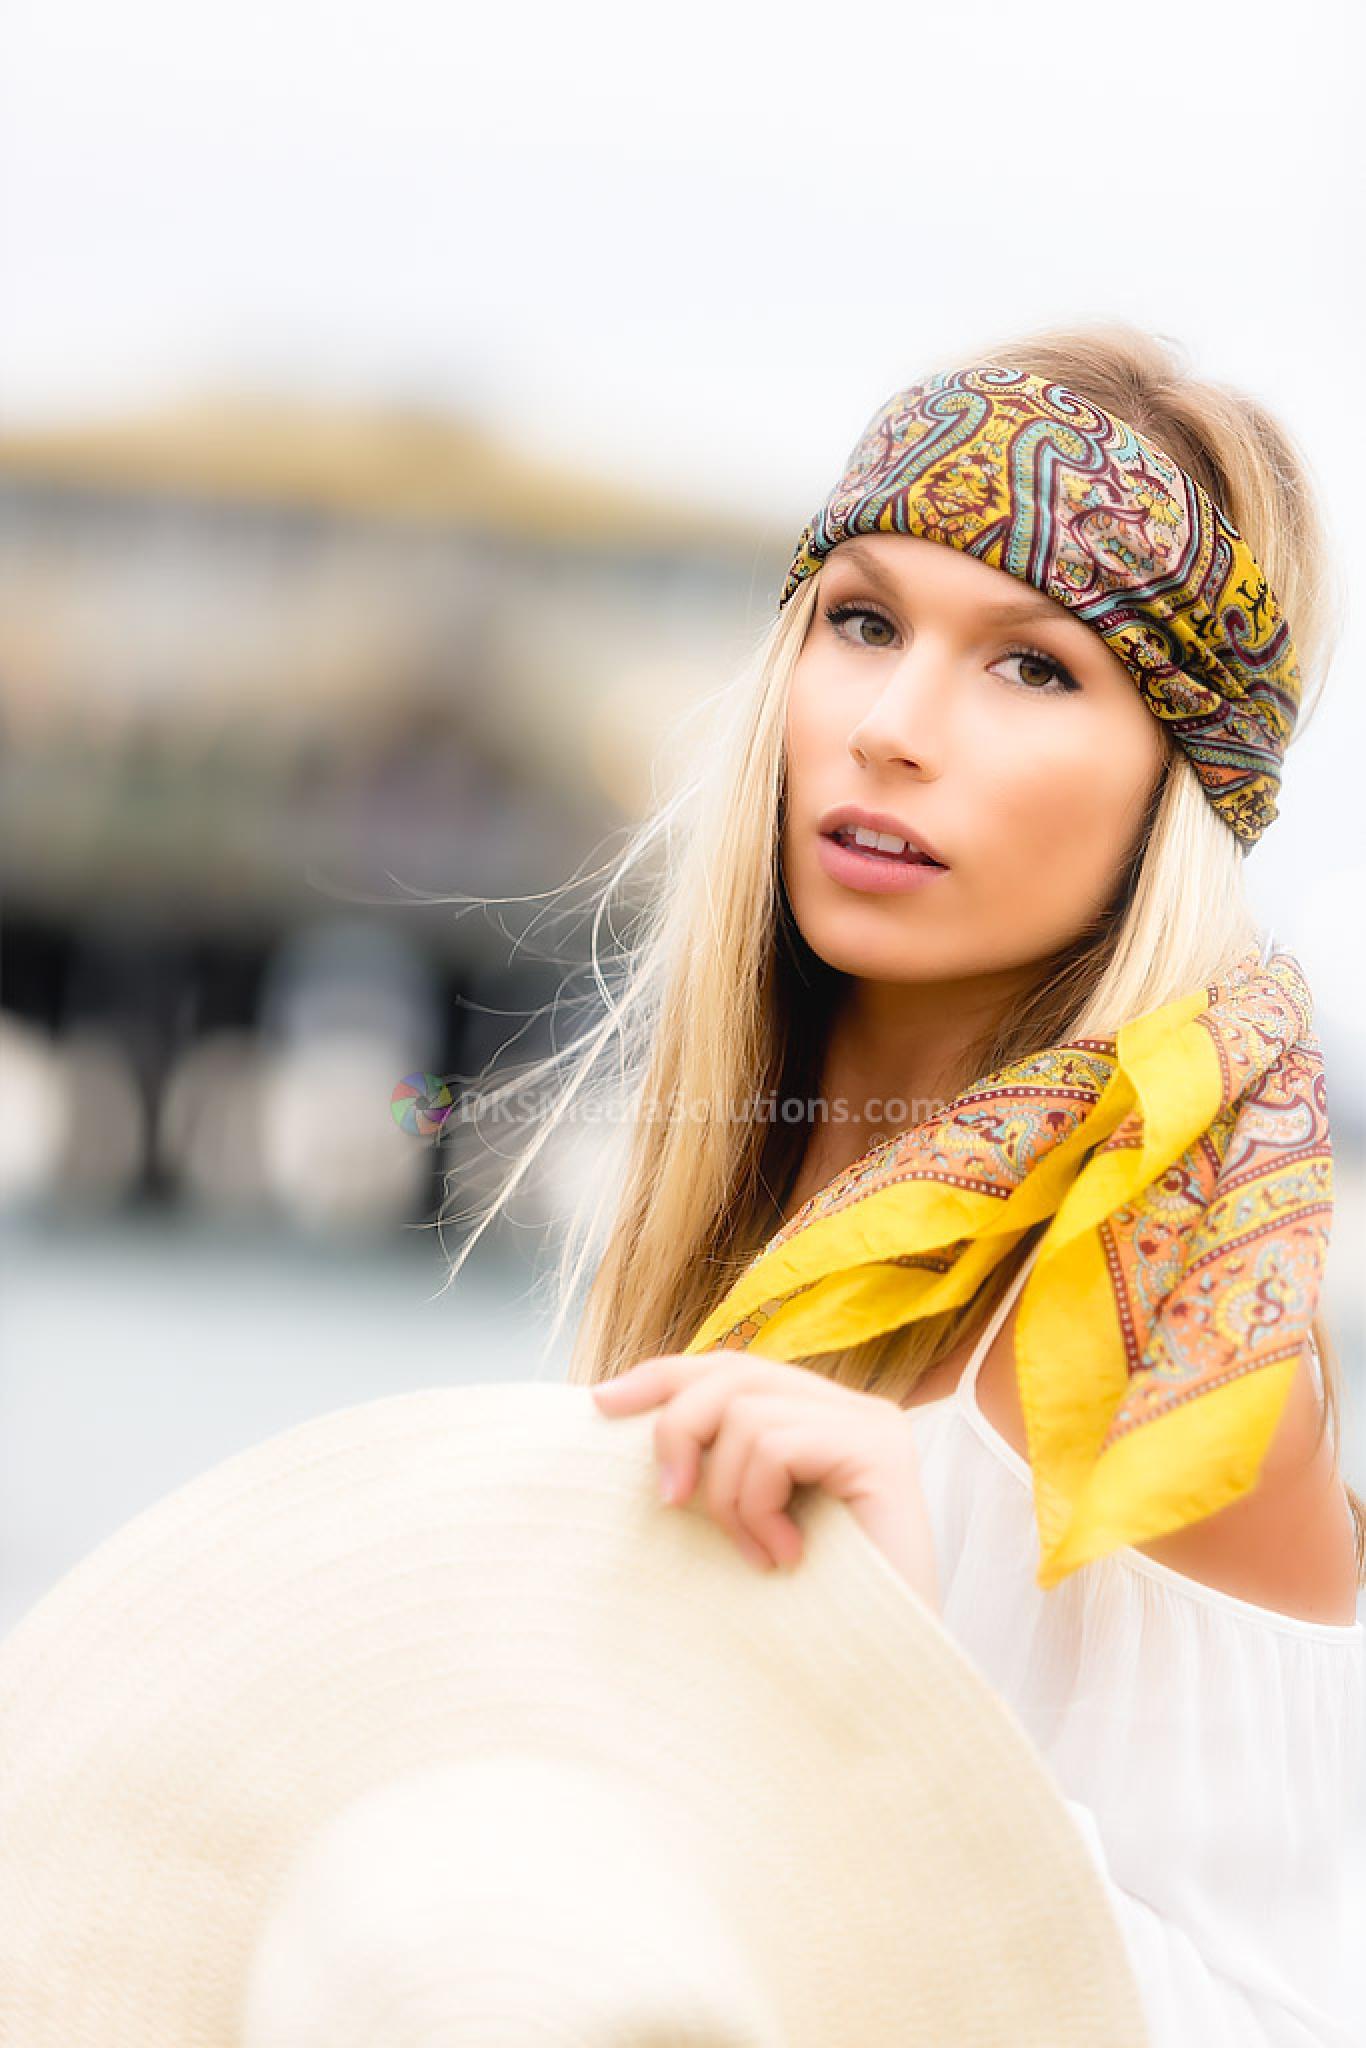 Photo in Portrait #model #female model #niki rae #david k. smith #dks media solutions #straw hat #white straw hat #white sundress #sundress #pier #santa monica pier #gold head scarf #head scarf #scarf #patterned scarf #blond #santa monica